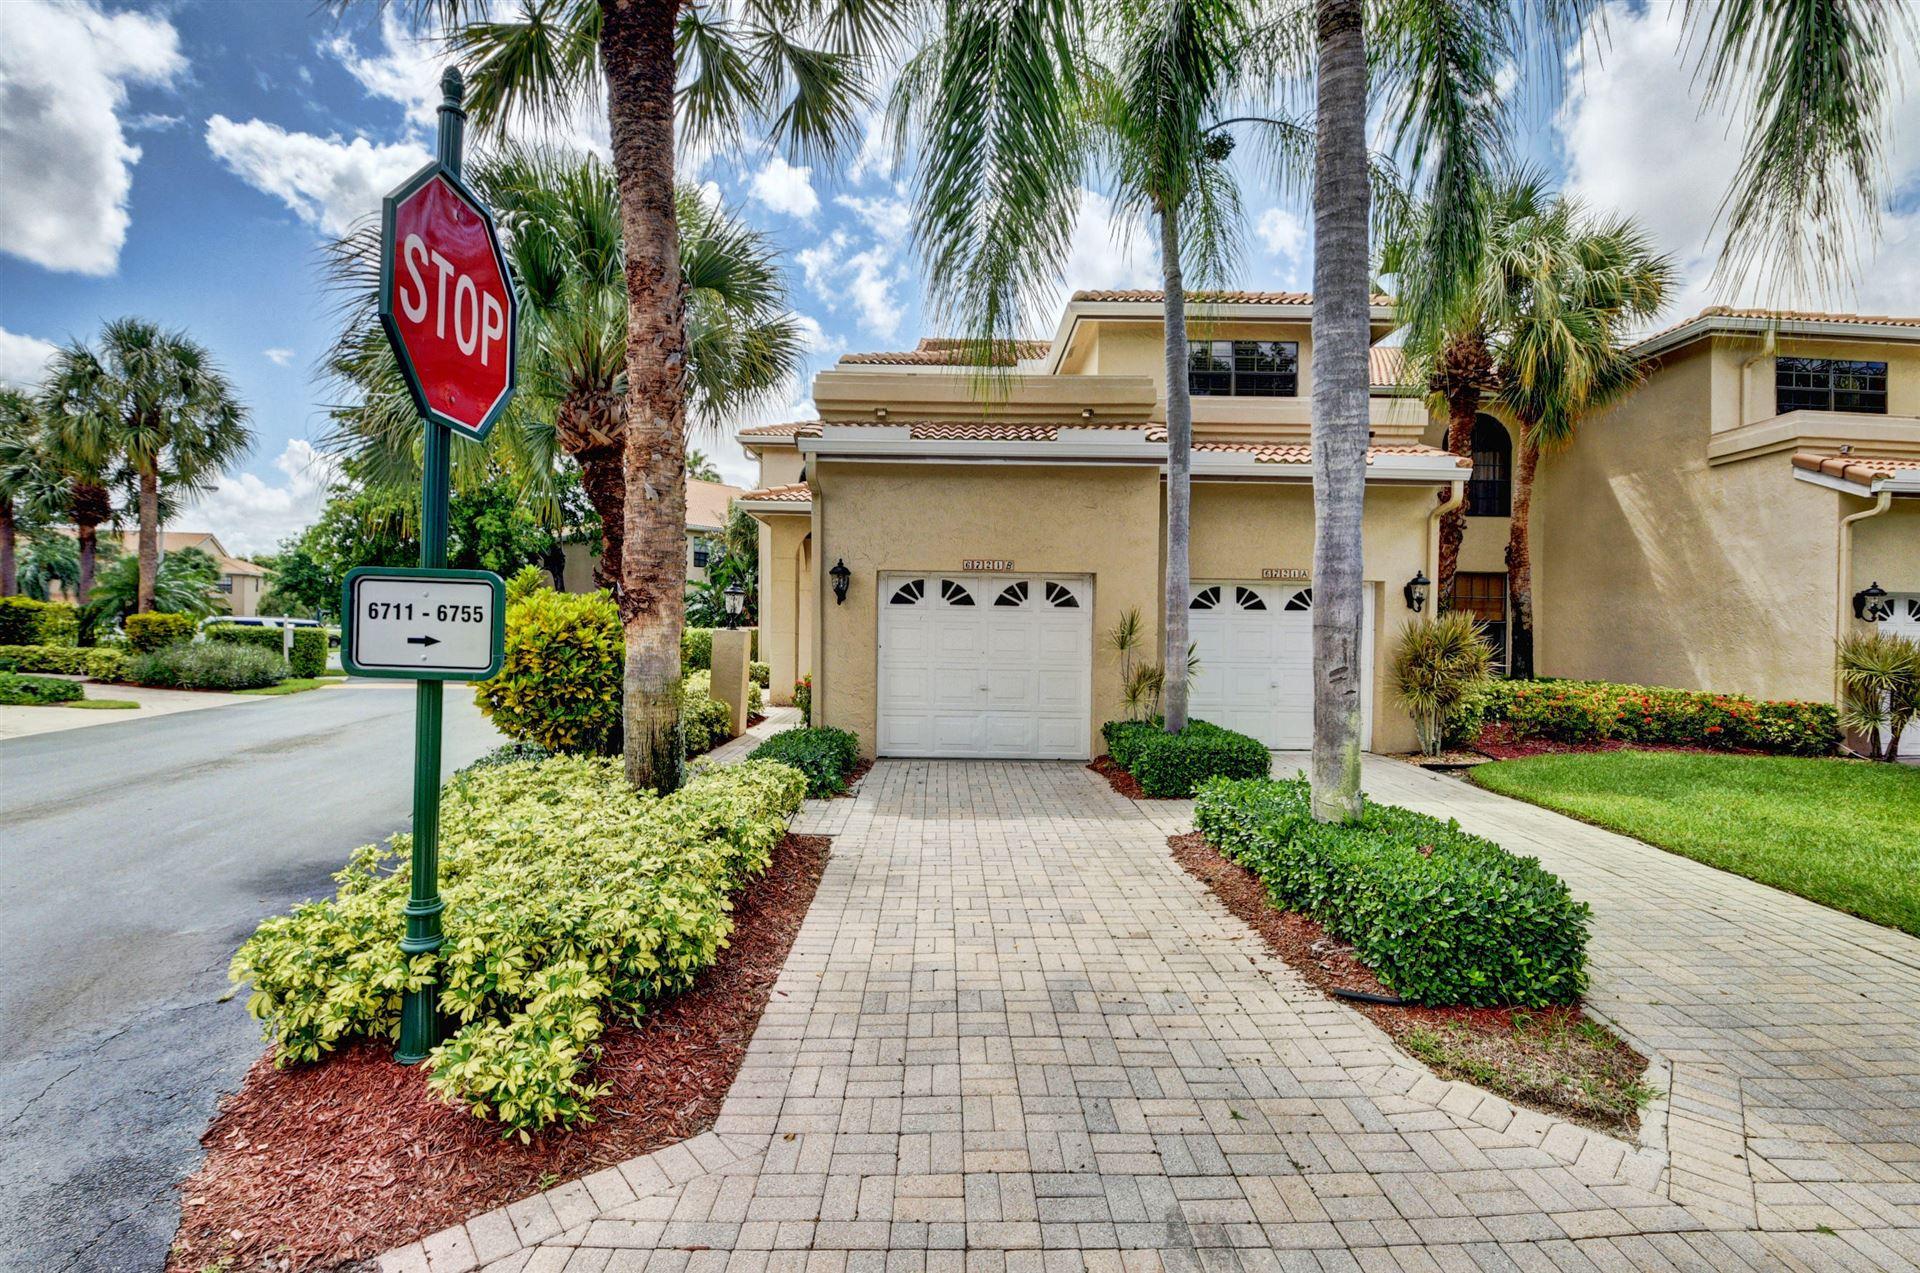 Photo of 6721 Montego Bay Boulevard #B, Boca Raton, FL 33433 (MLS # RX-10626831)